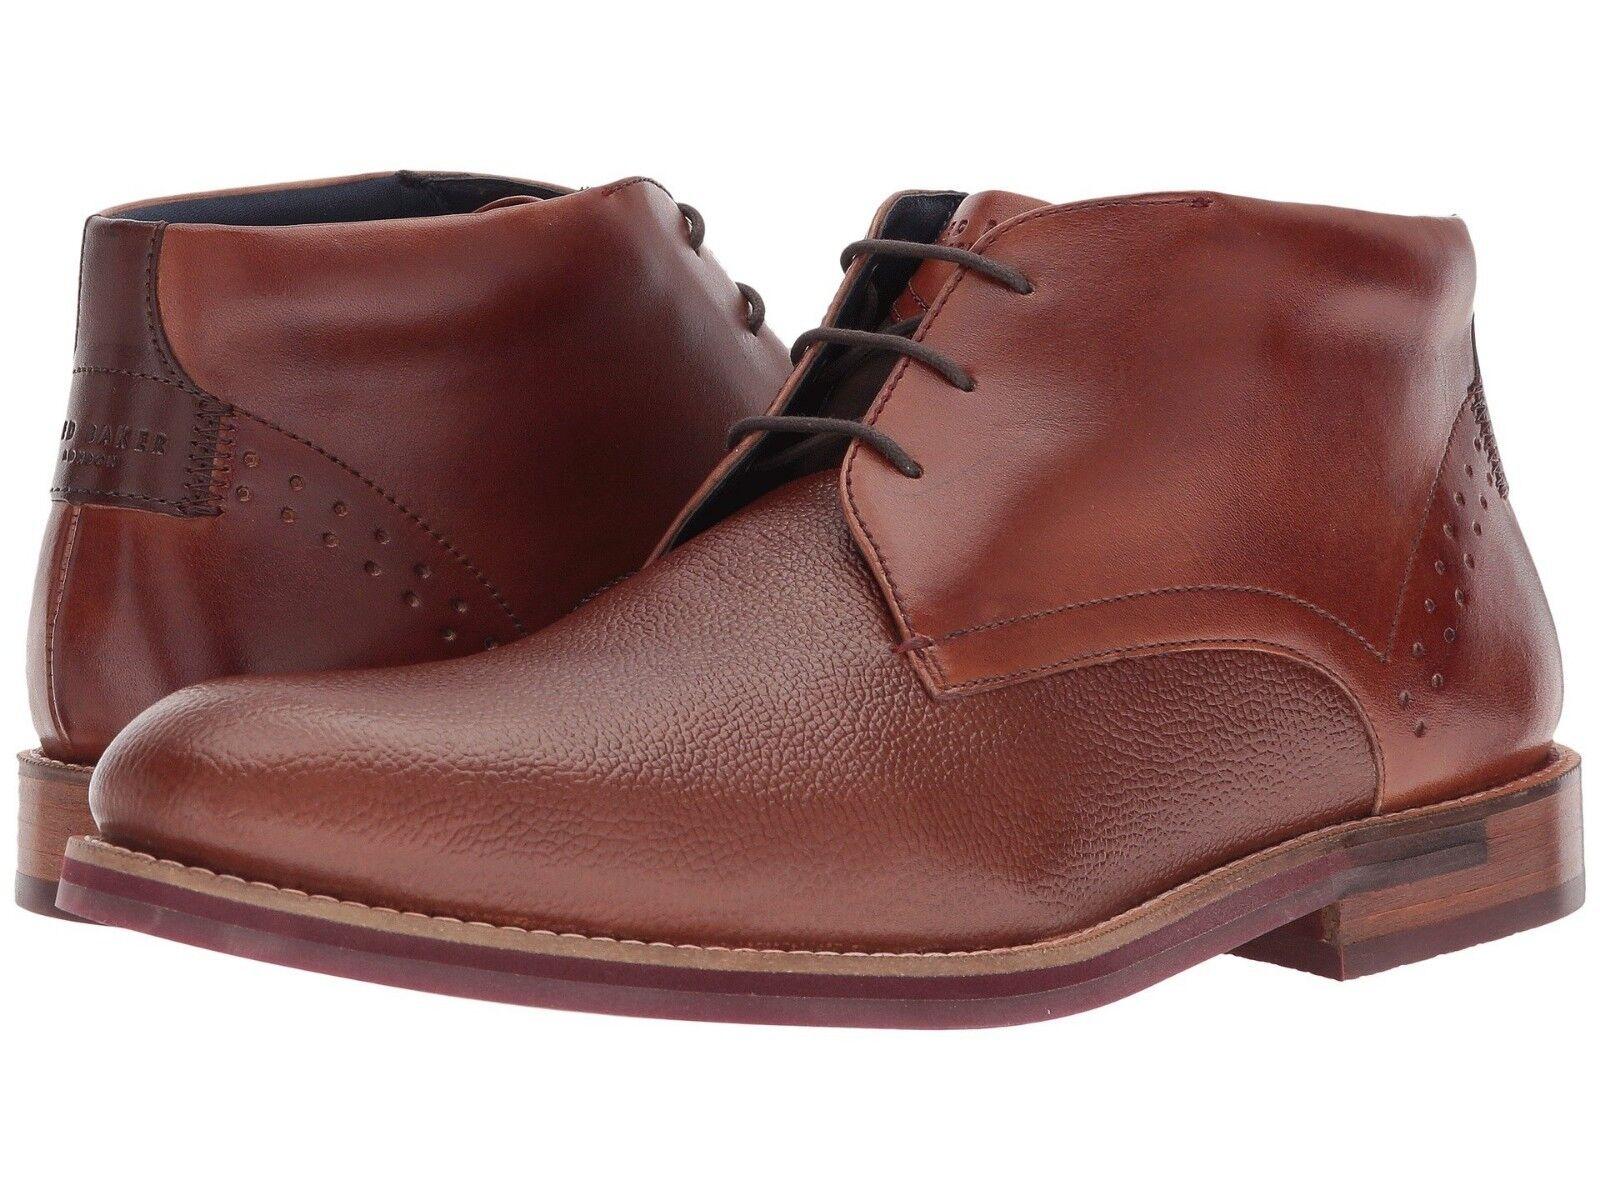 NEW Ted Baker Men's  Daiino Boot - Sz 10 D (NWB)